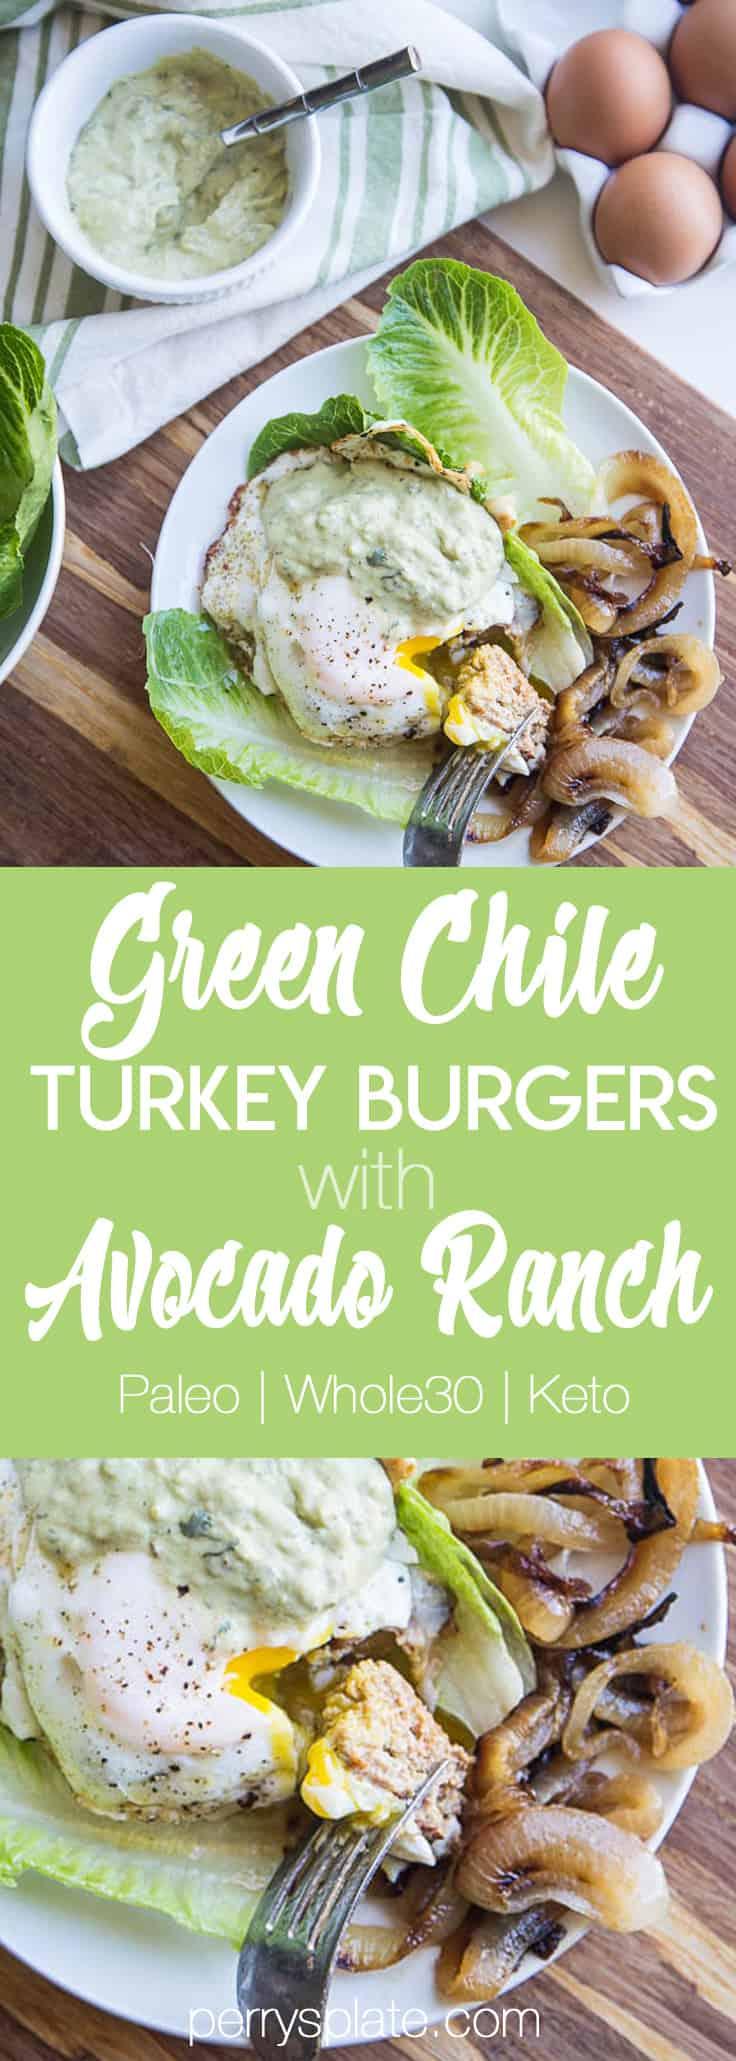 Green Chile Turkey Burgers with Avocado-Ranch | Paleo recipes | Whole30 recipes | Keto recipes | Low-Carb Recipes | perrysplate.com